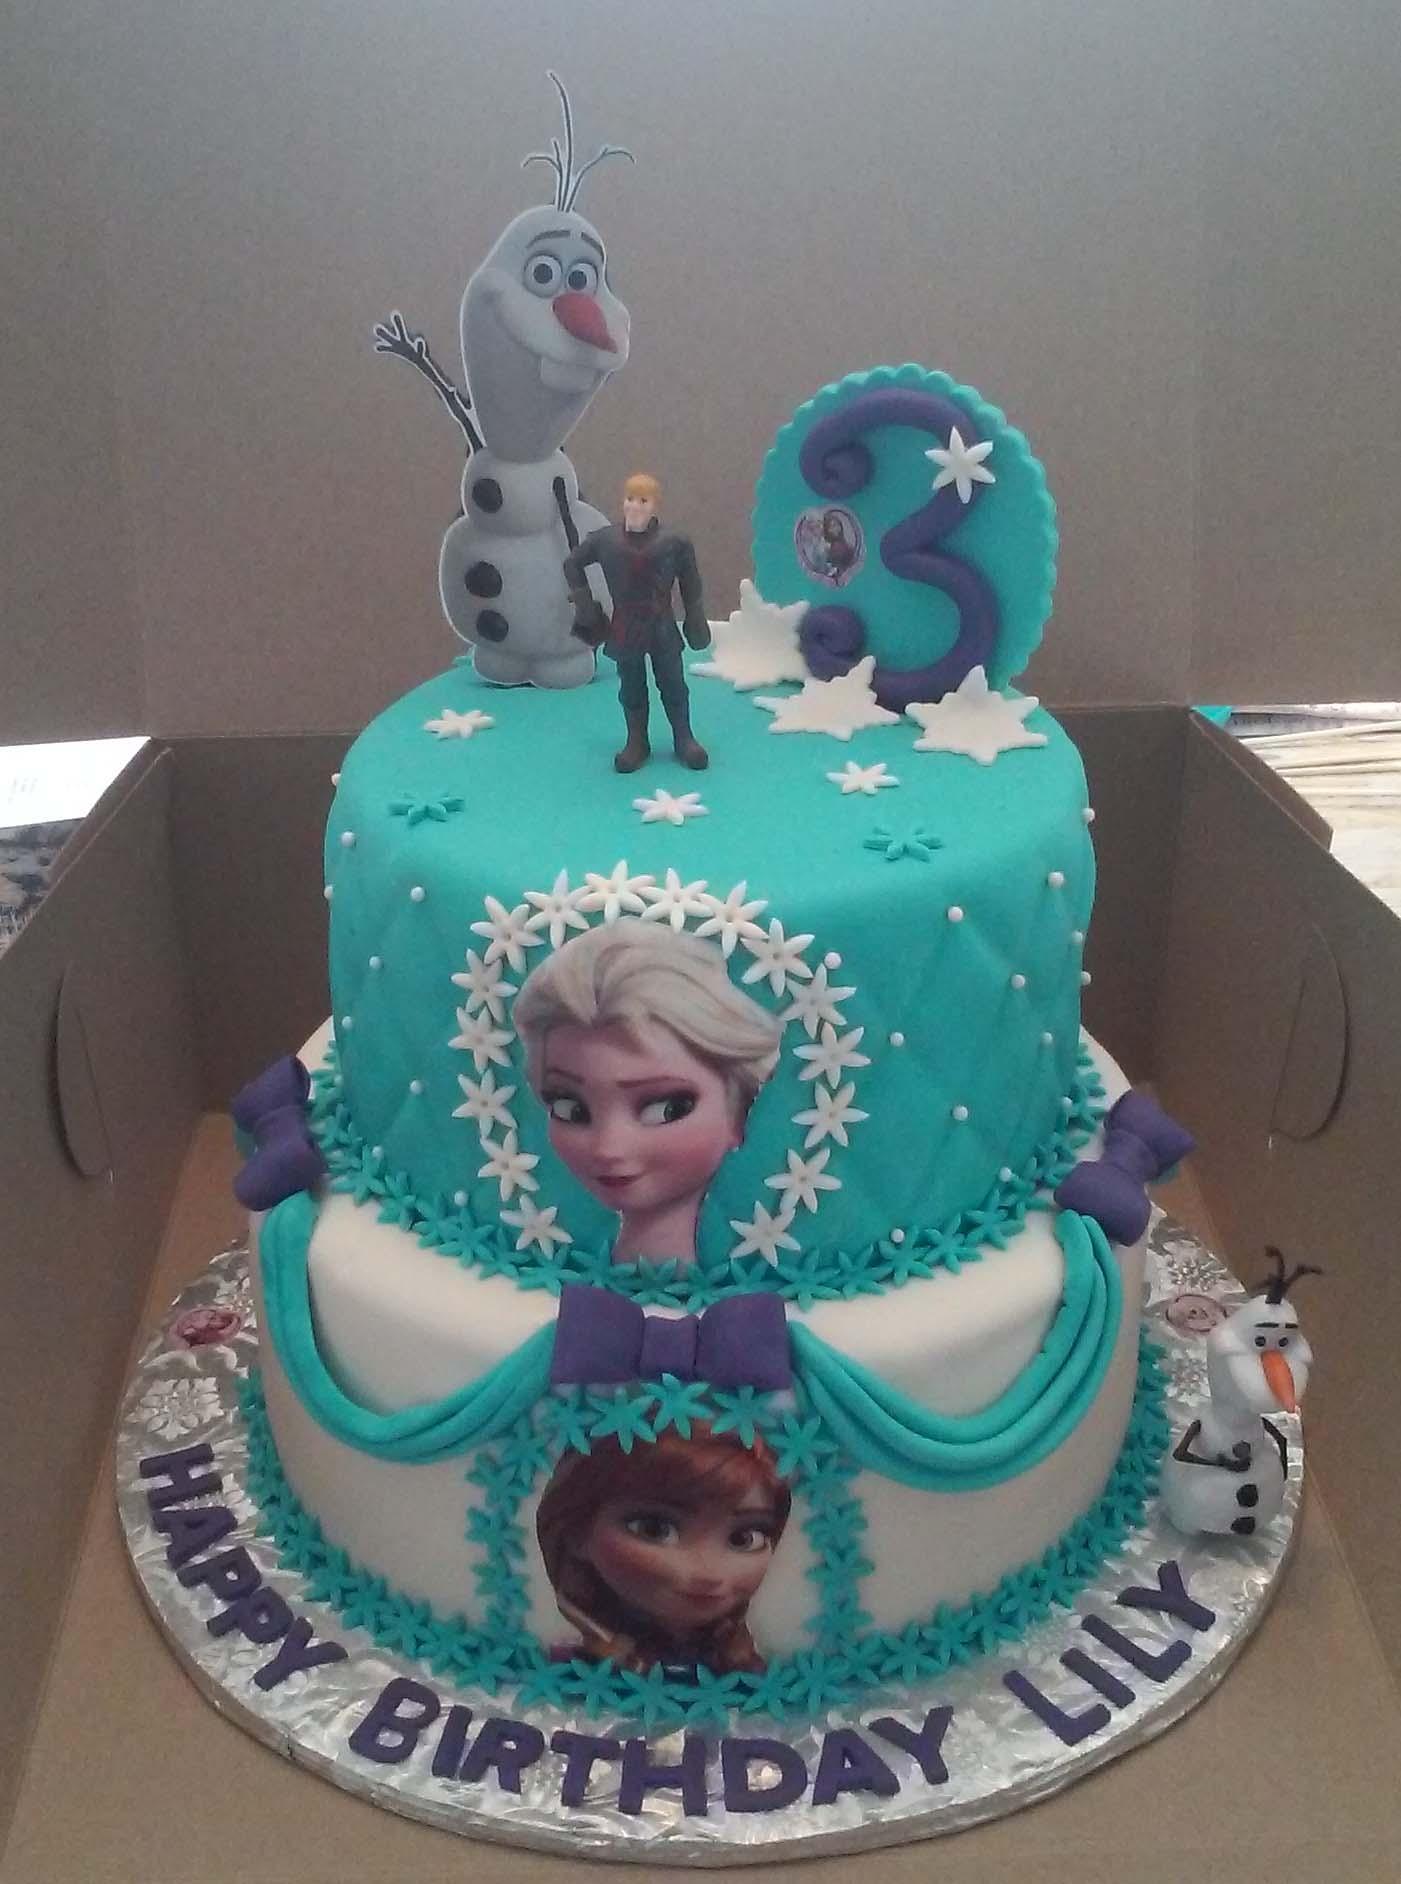 Surprising 9 Elsa Themed Birthday Cakes Photo Birthday Cake Frozen Elsa Birthday Cards Printable Benkemecafe Filternl